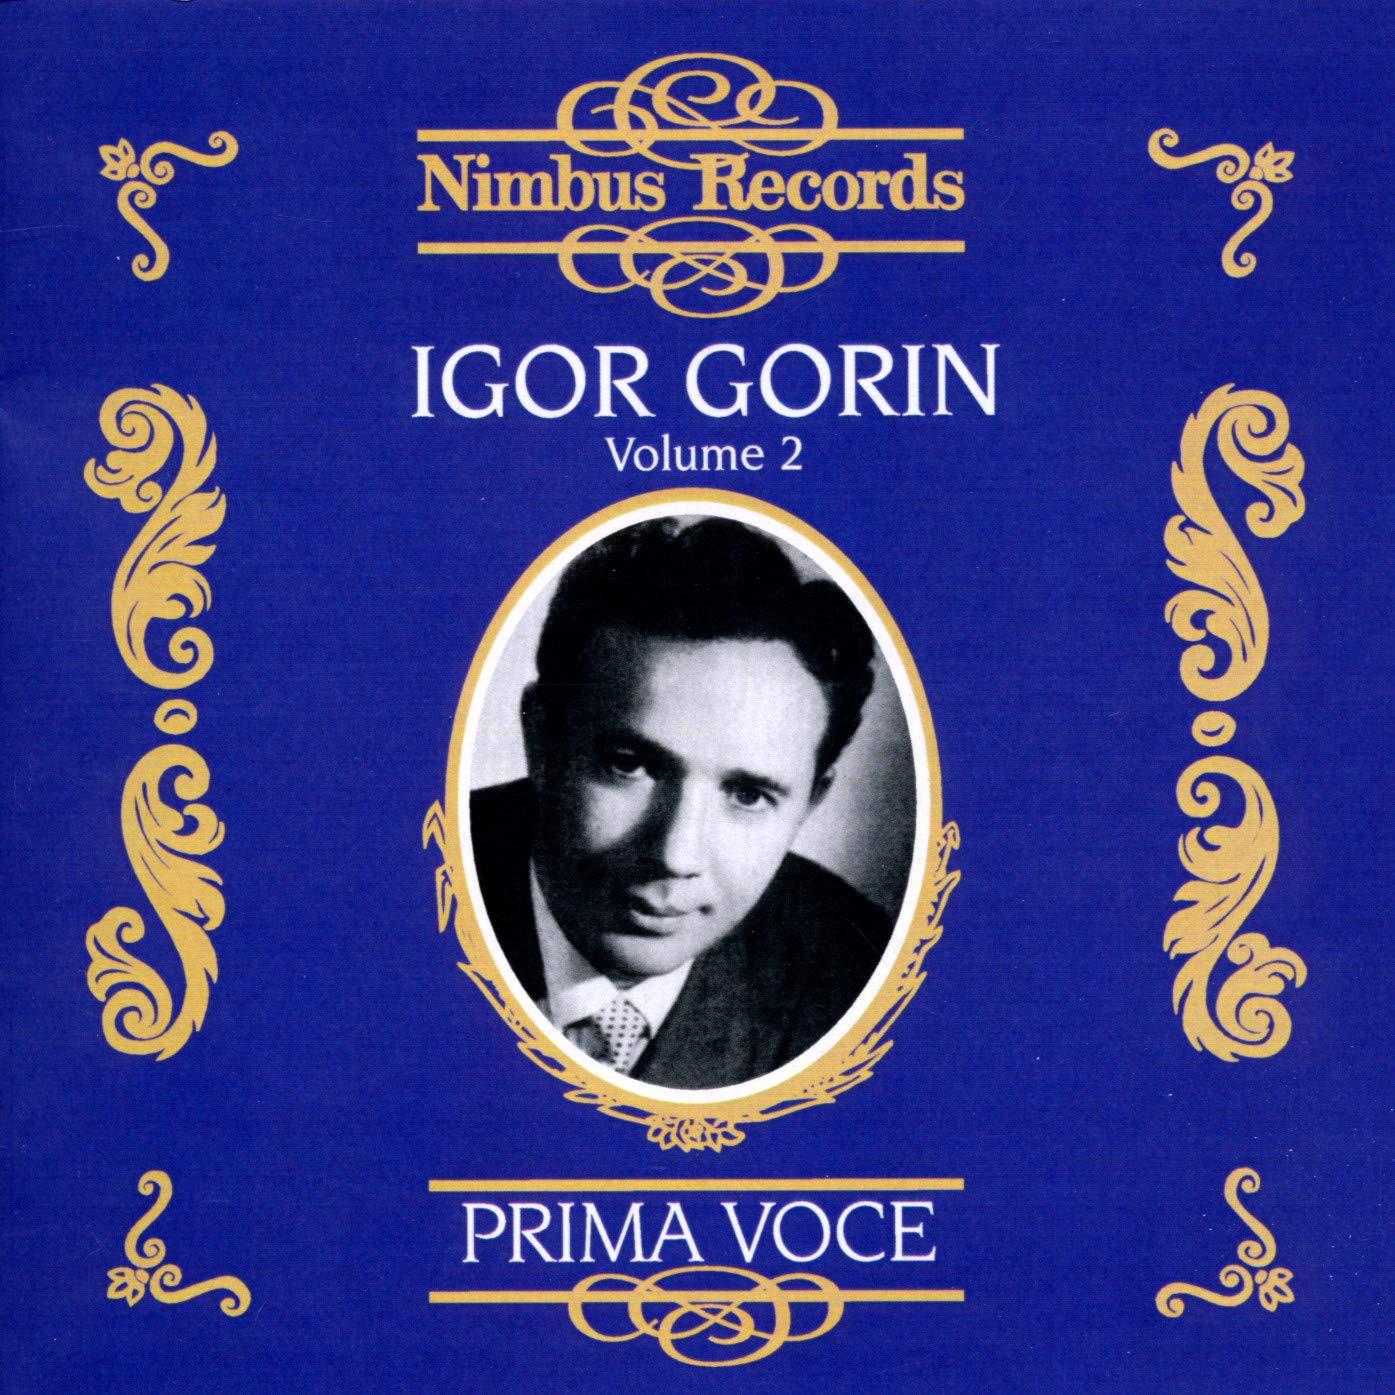 Igor Gorin 2: Prima Voce Selling sale rankings